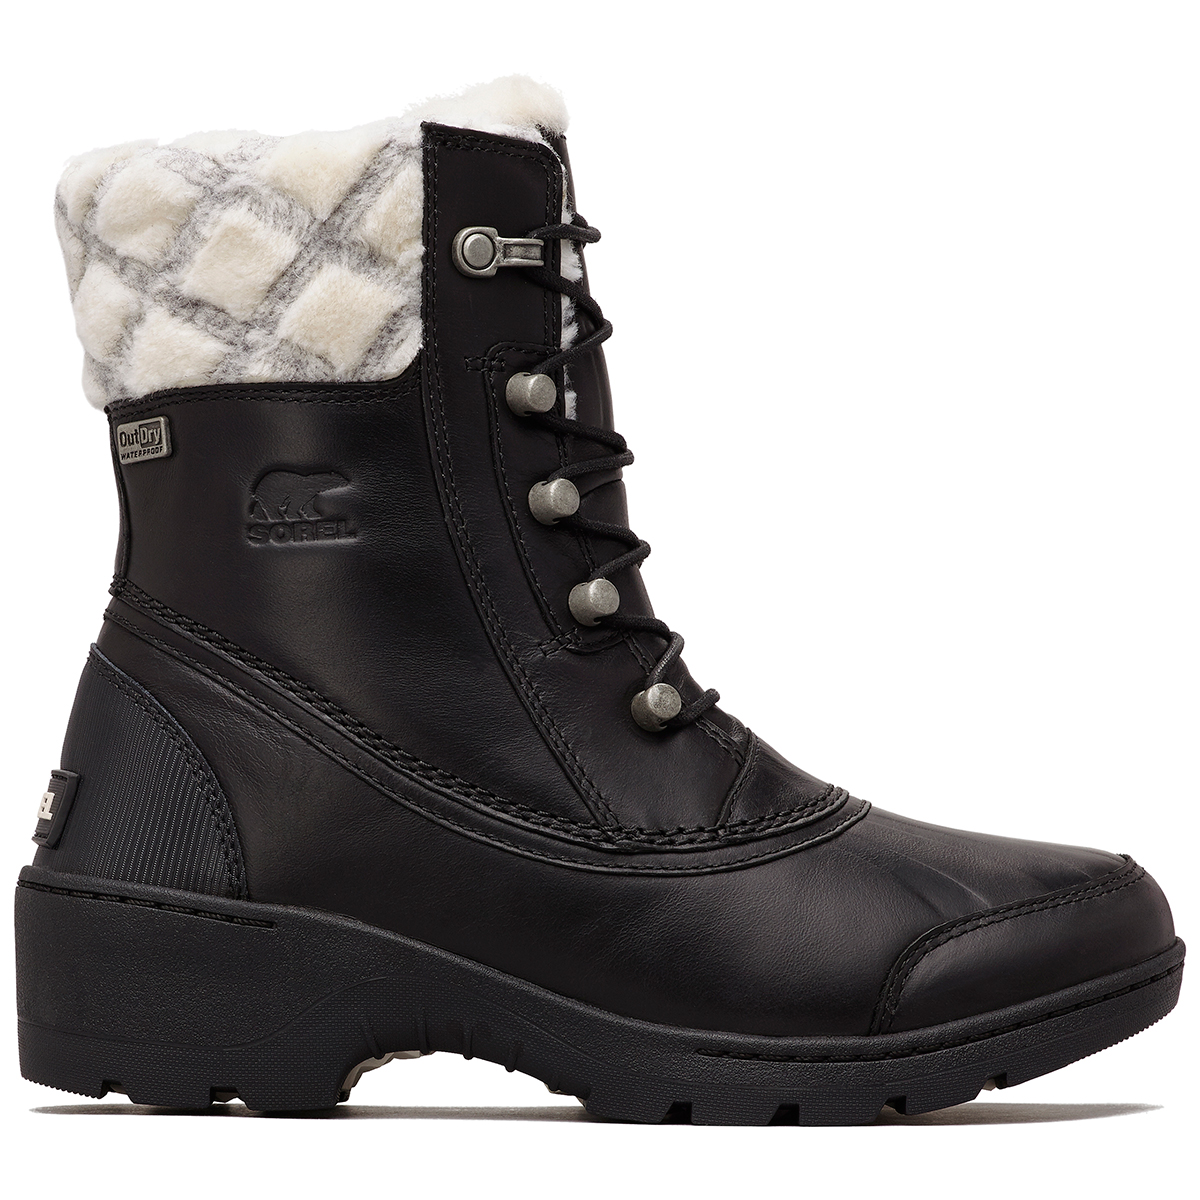 Sorel Women's Whistler Mid Waterproof Insulated Storm Boots - Black, 8.5